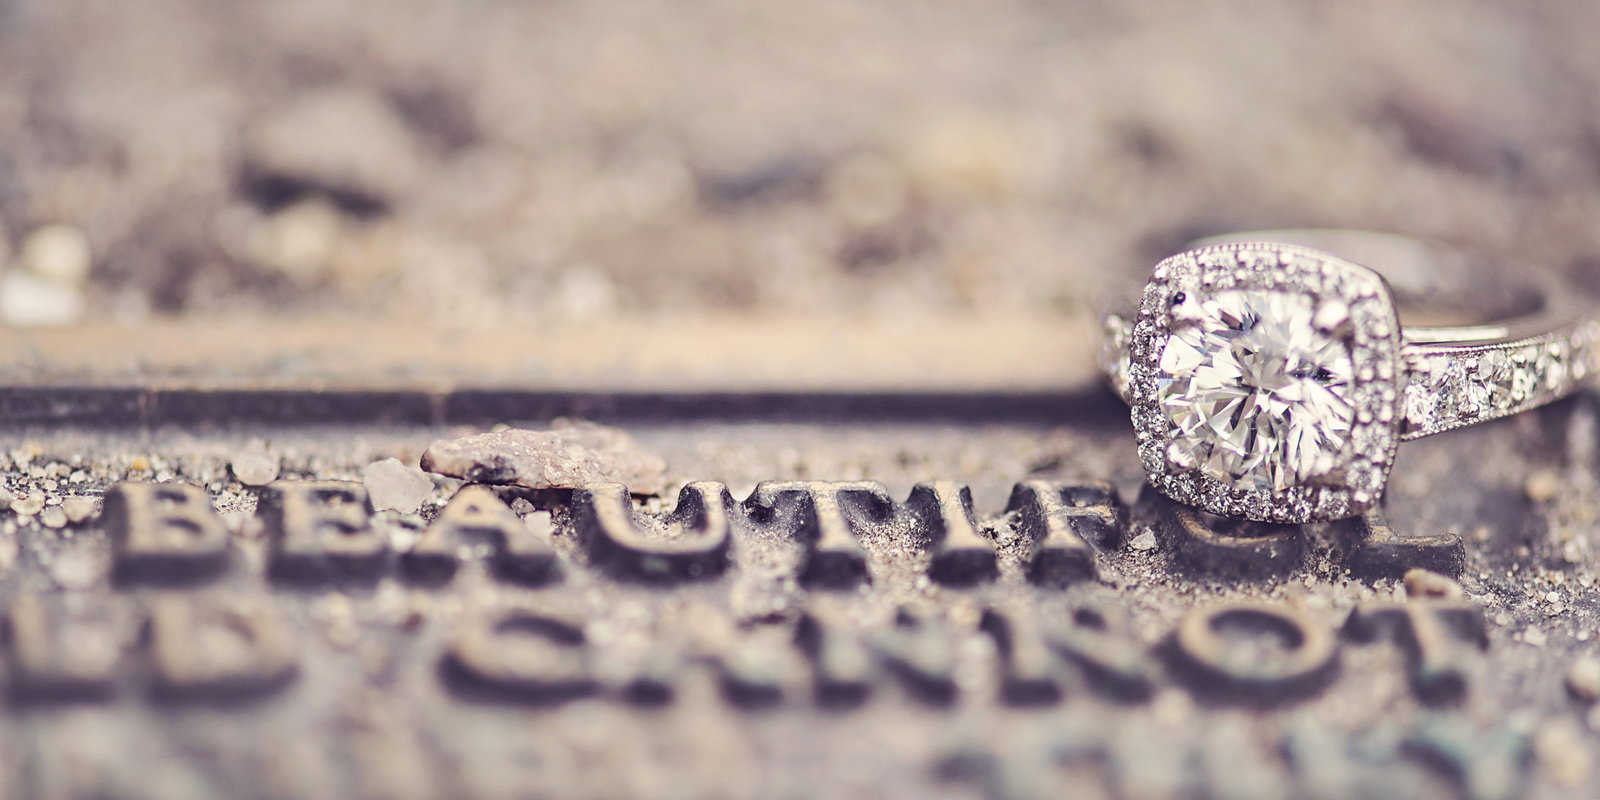 boston_saratoga_springs_wedding_proposal_photography_052